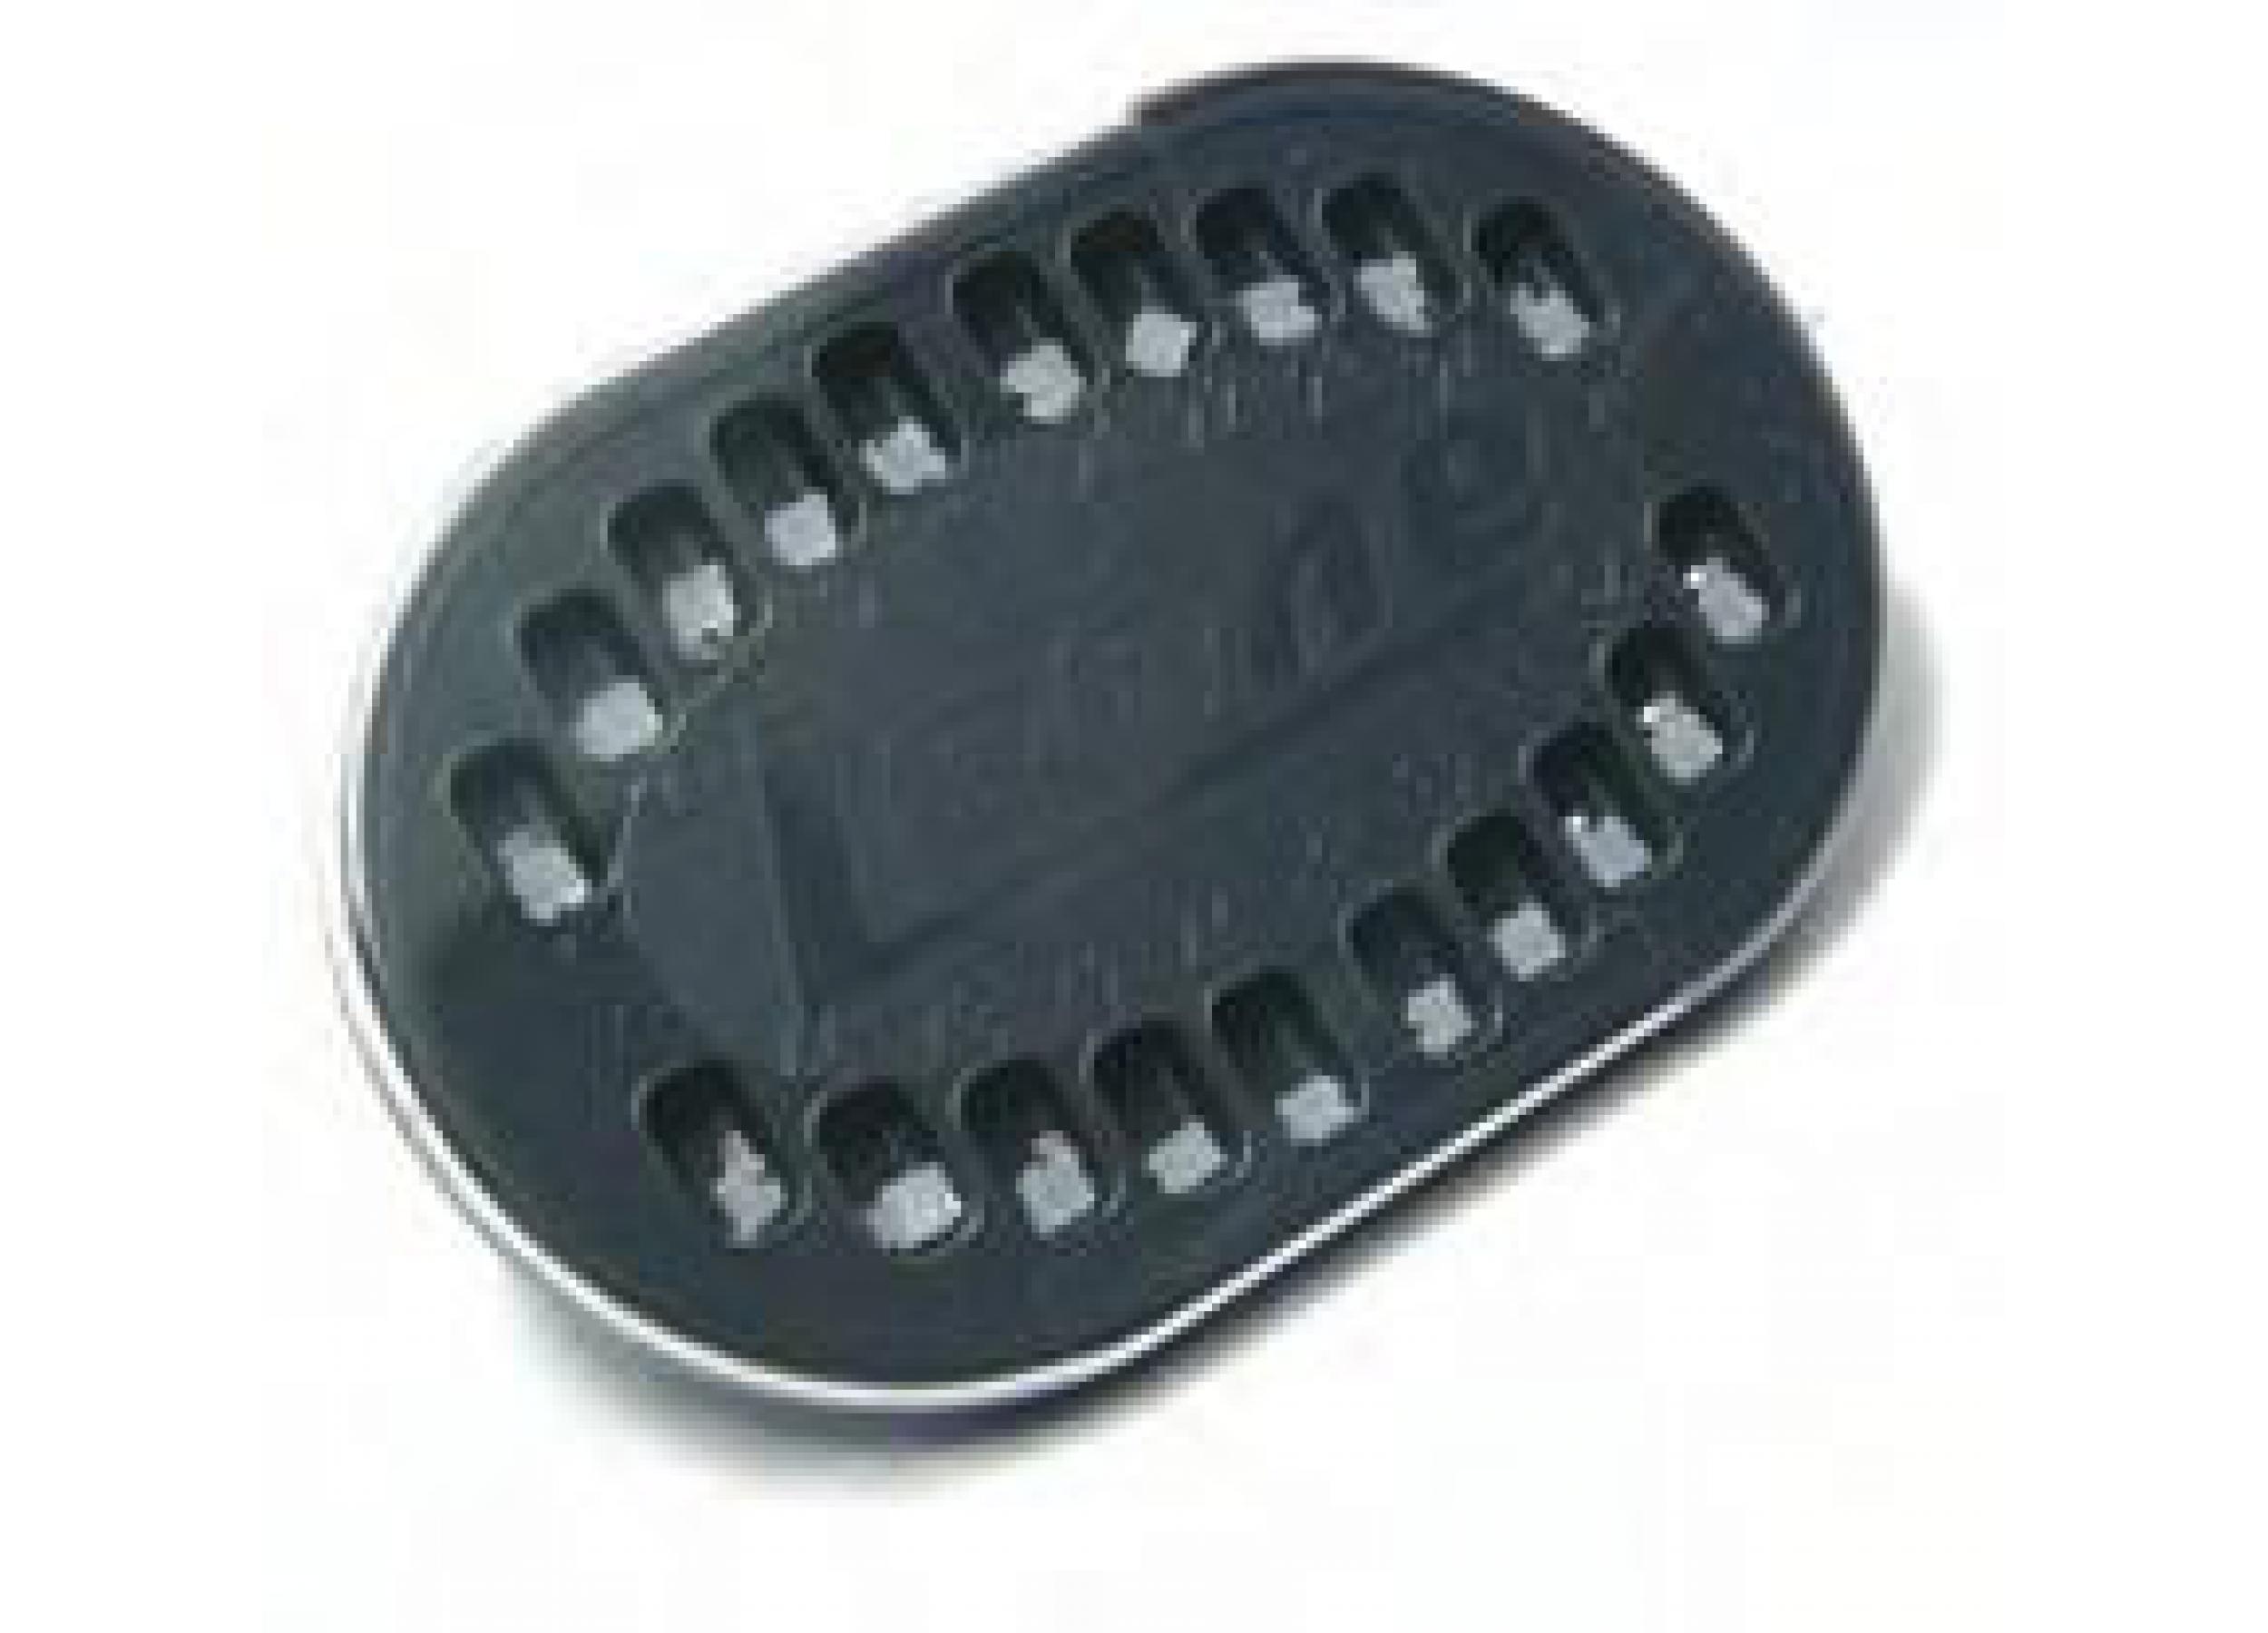 F5620-22 Набор САПФИРОВЫХ брекетов ICE-ROTH .022 (20 шт.)